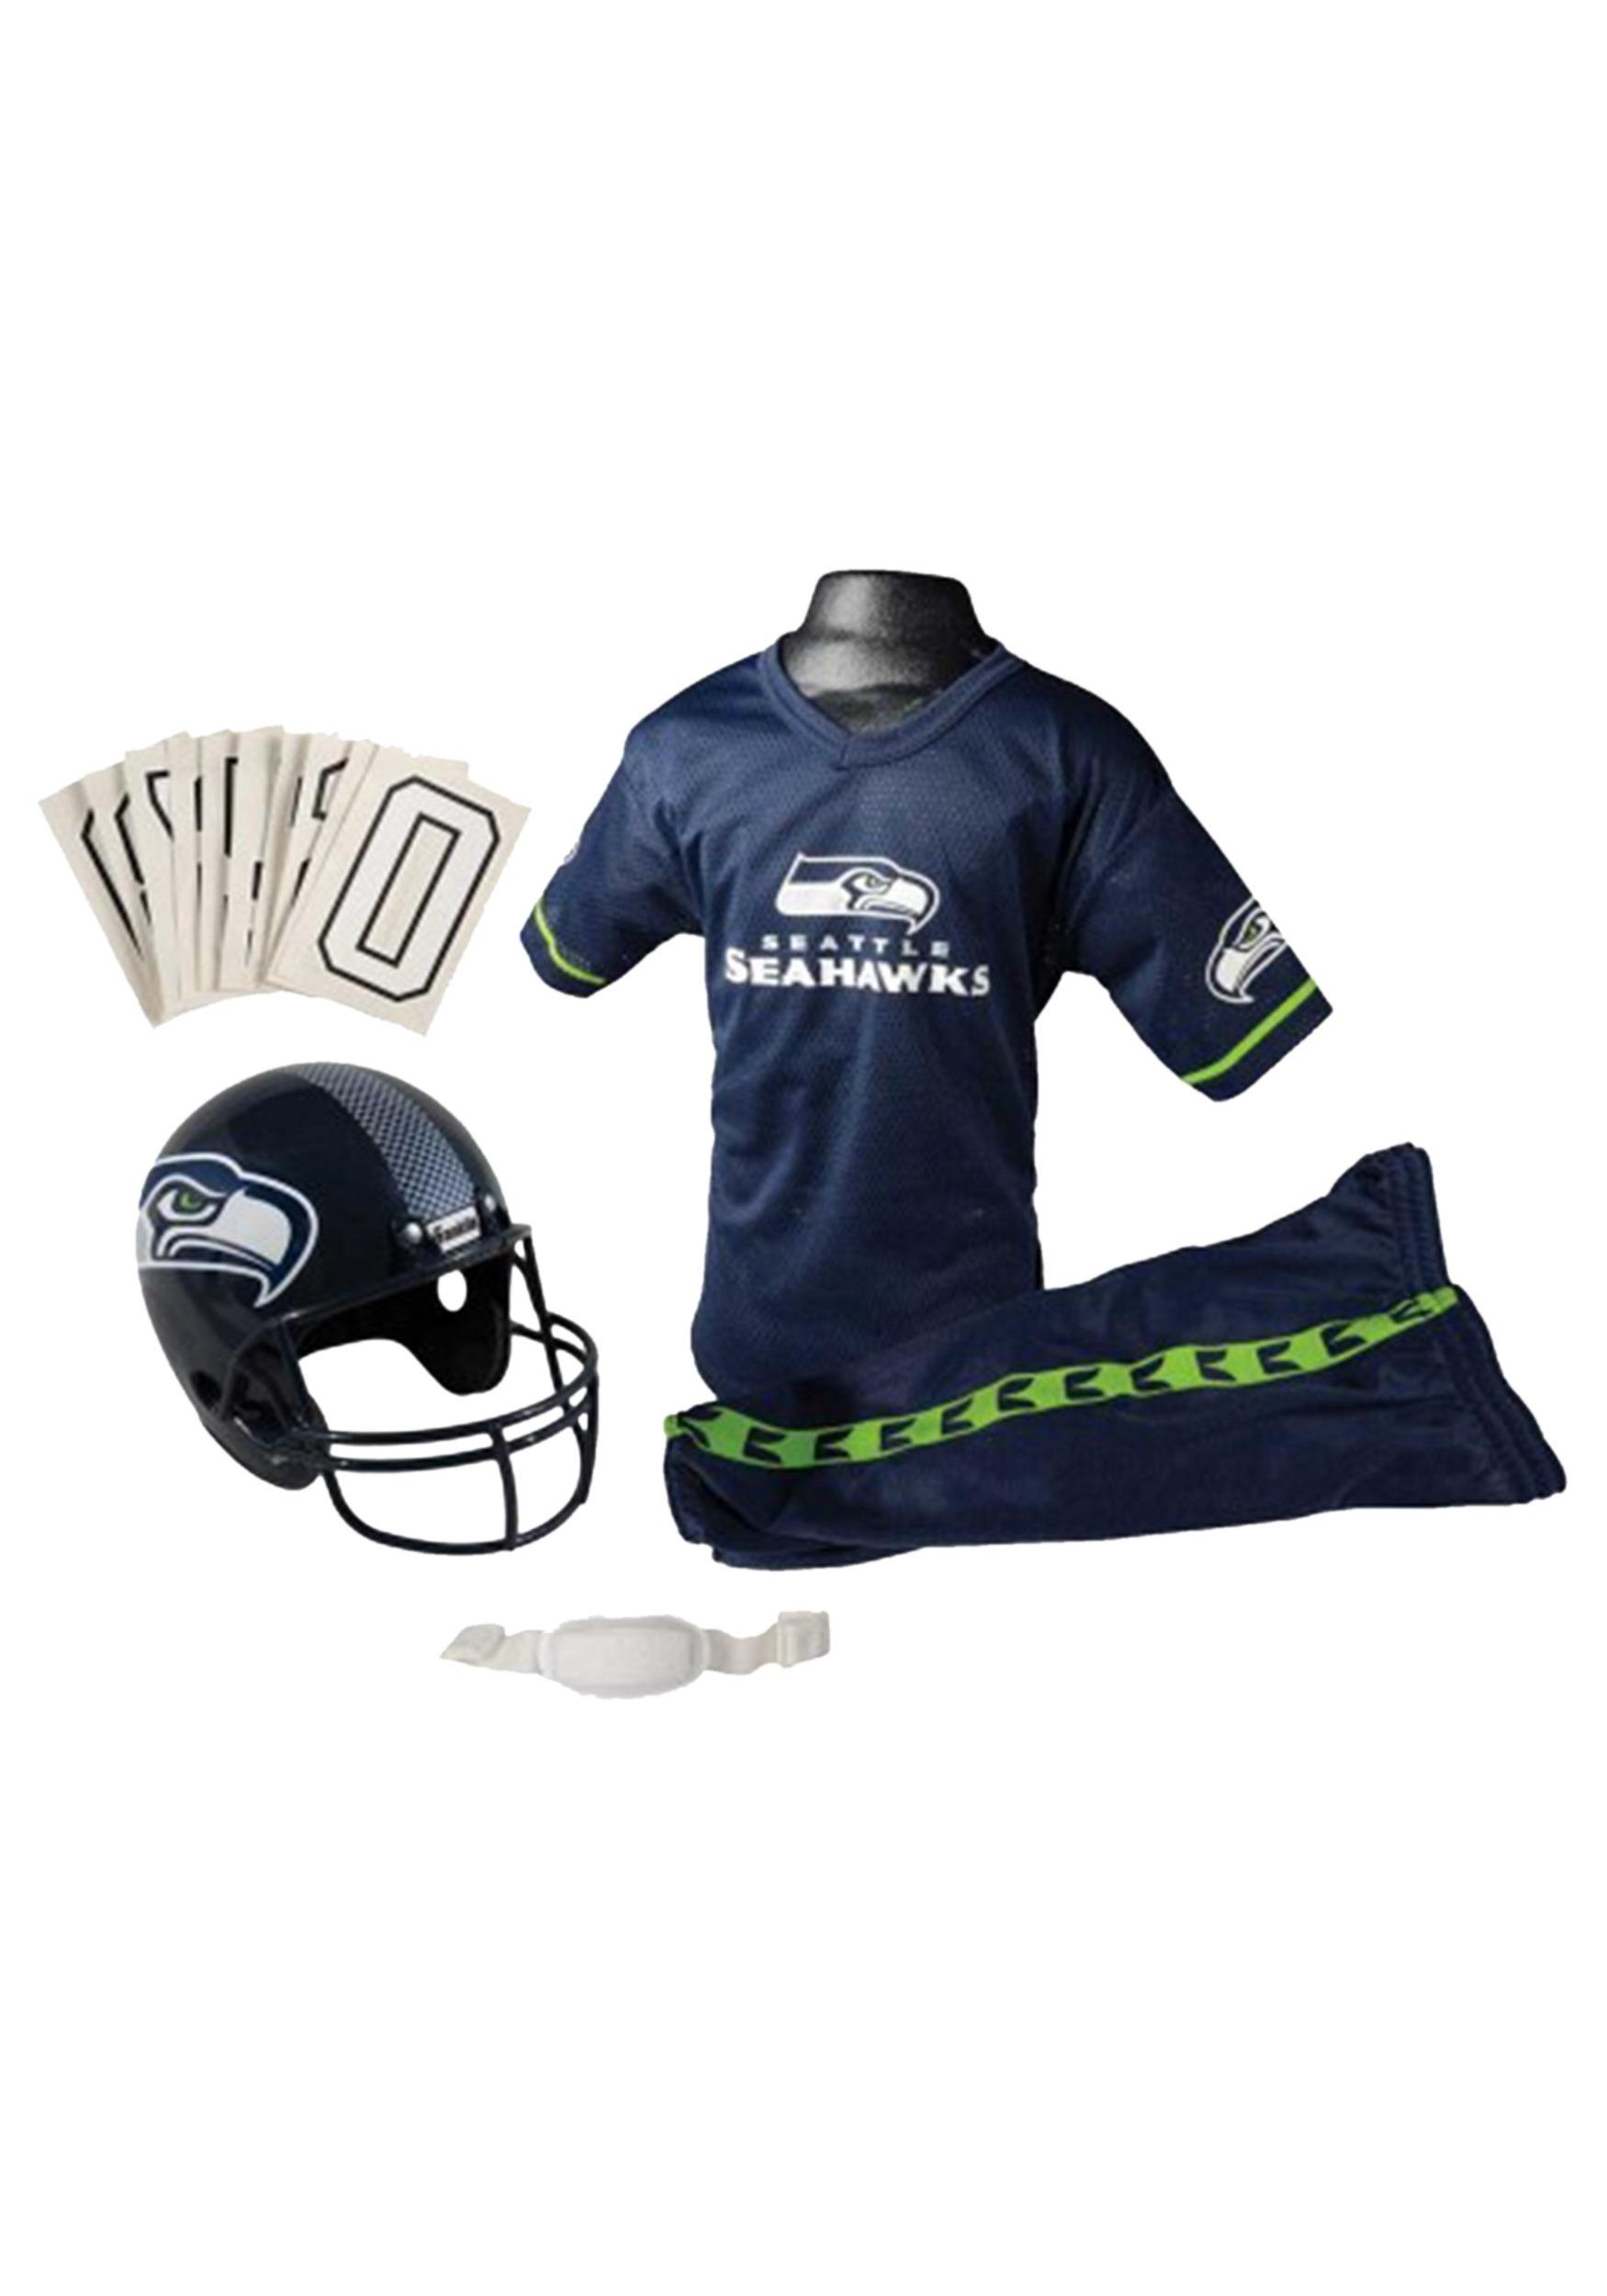 6e6ff94f NFL Seahawks Uniform Costume